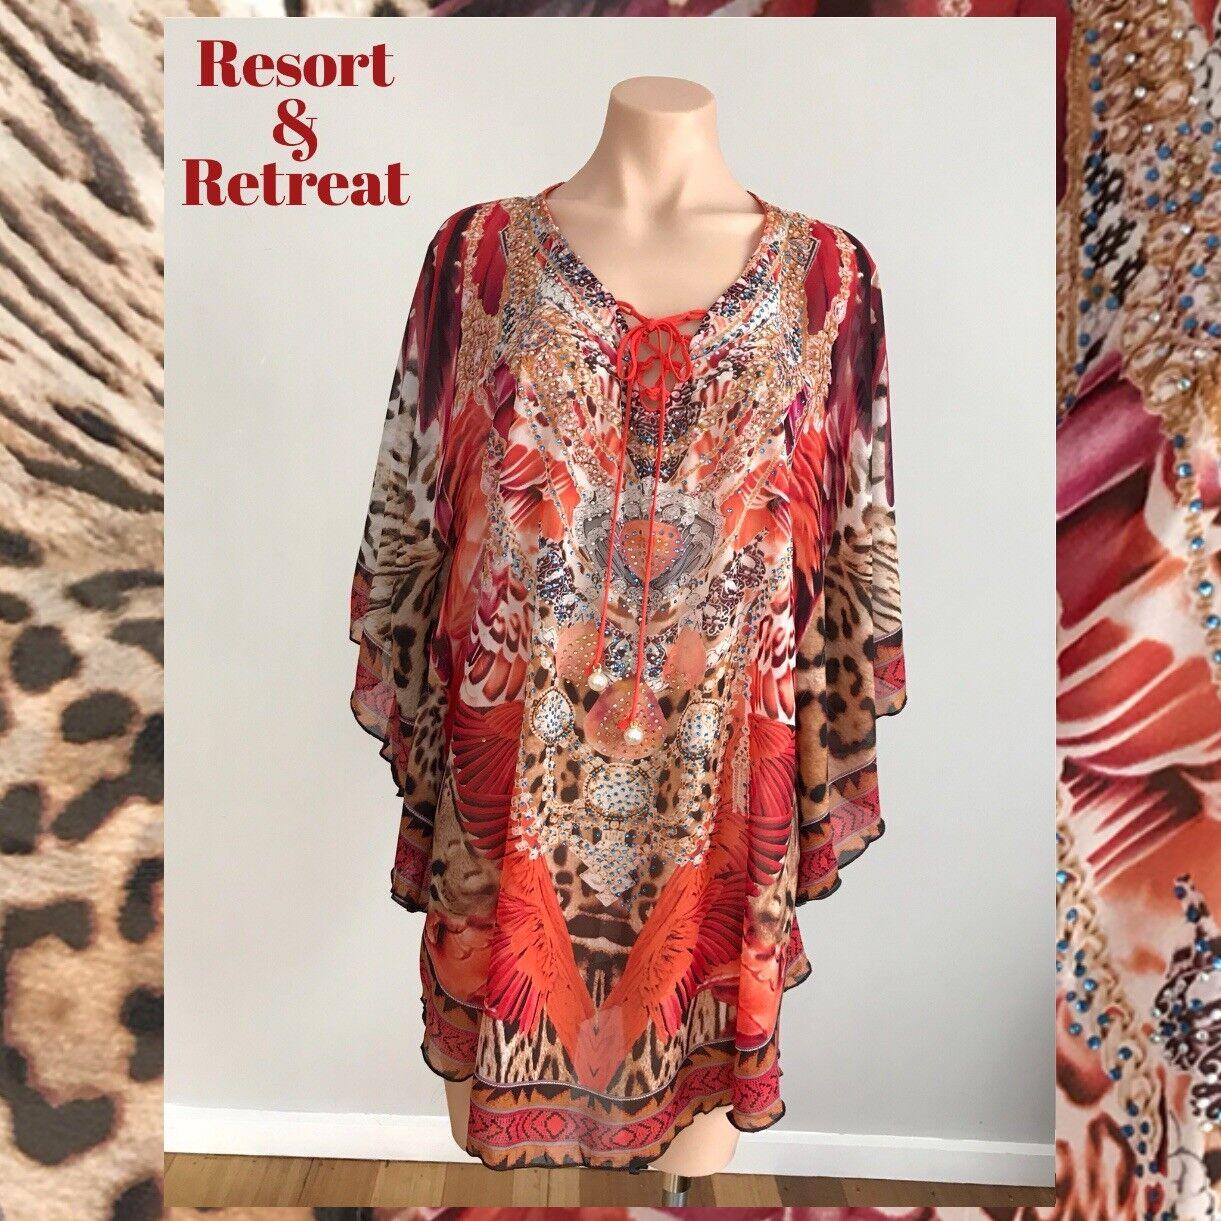 Crystal Embellished Kaftan M L 10-18, Resort Wear, Tribal Print